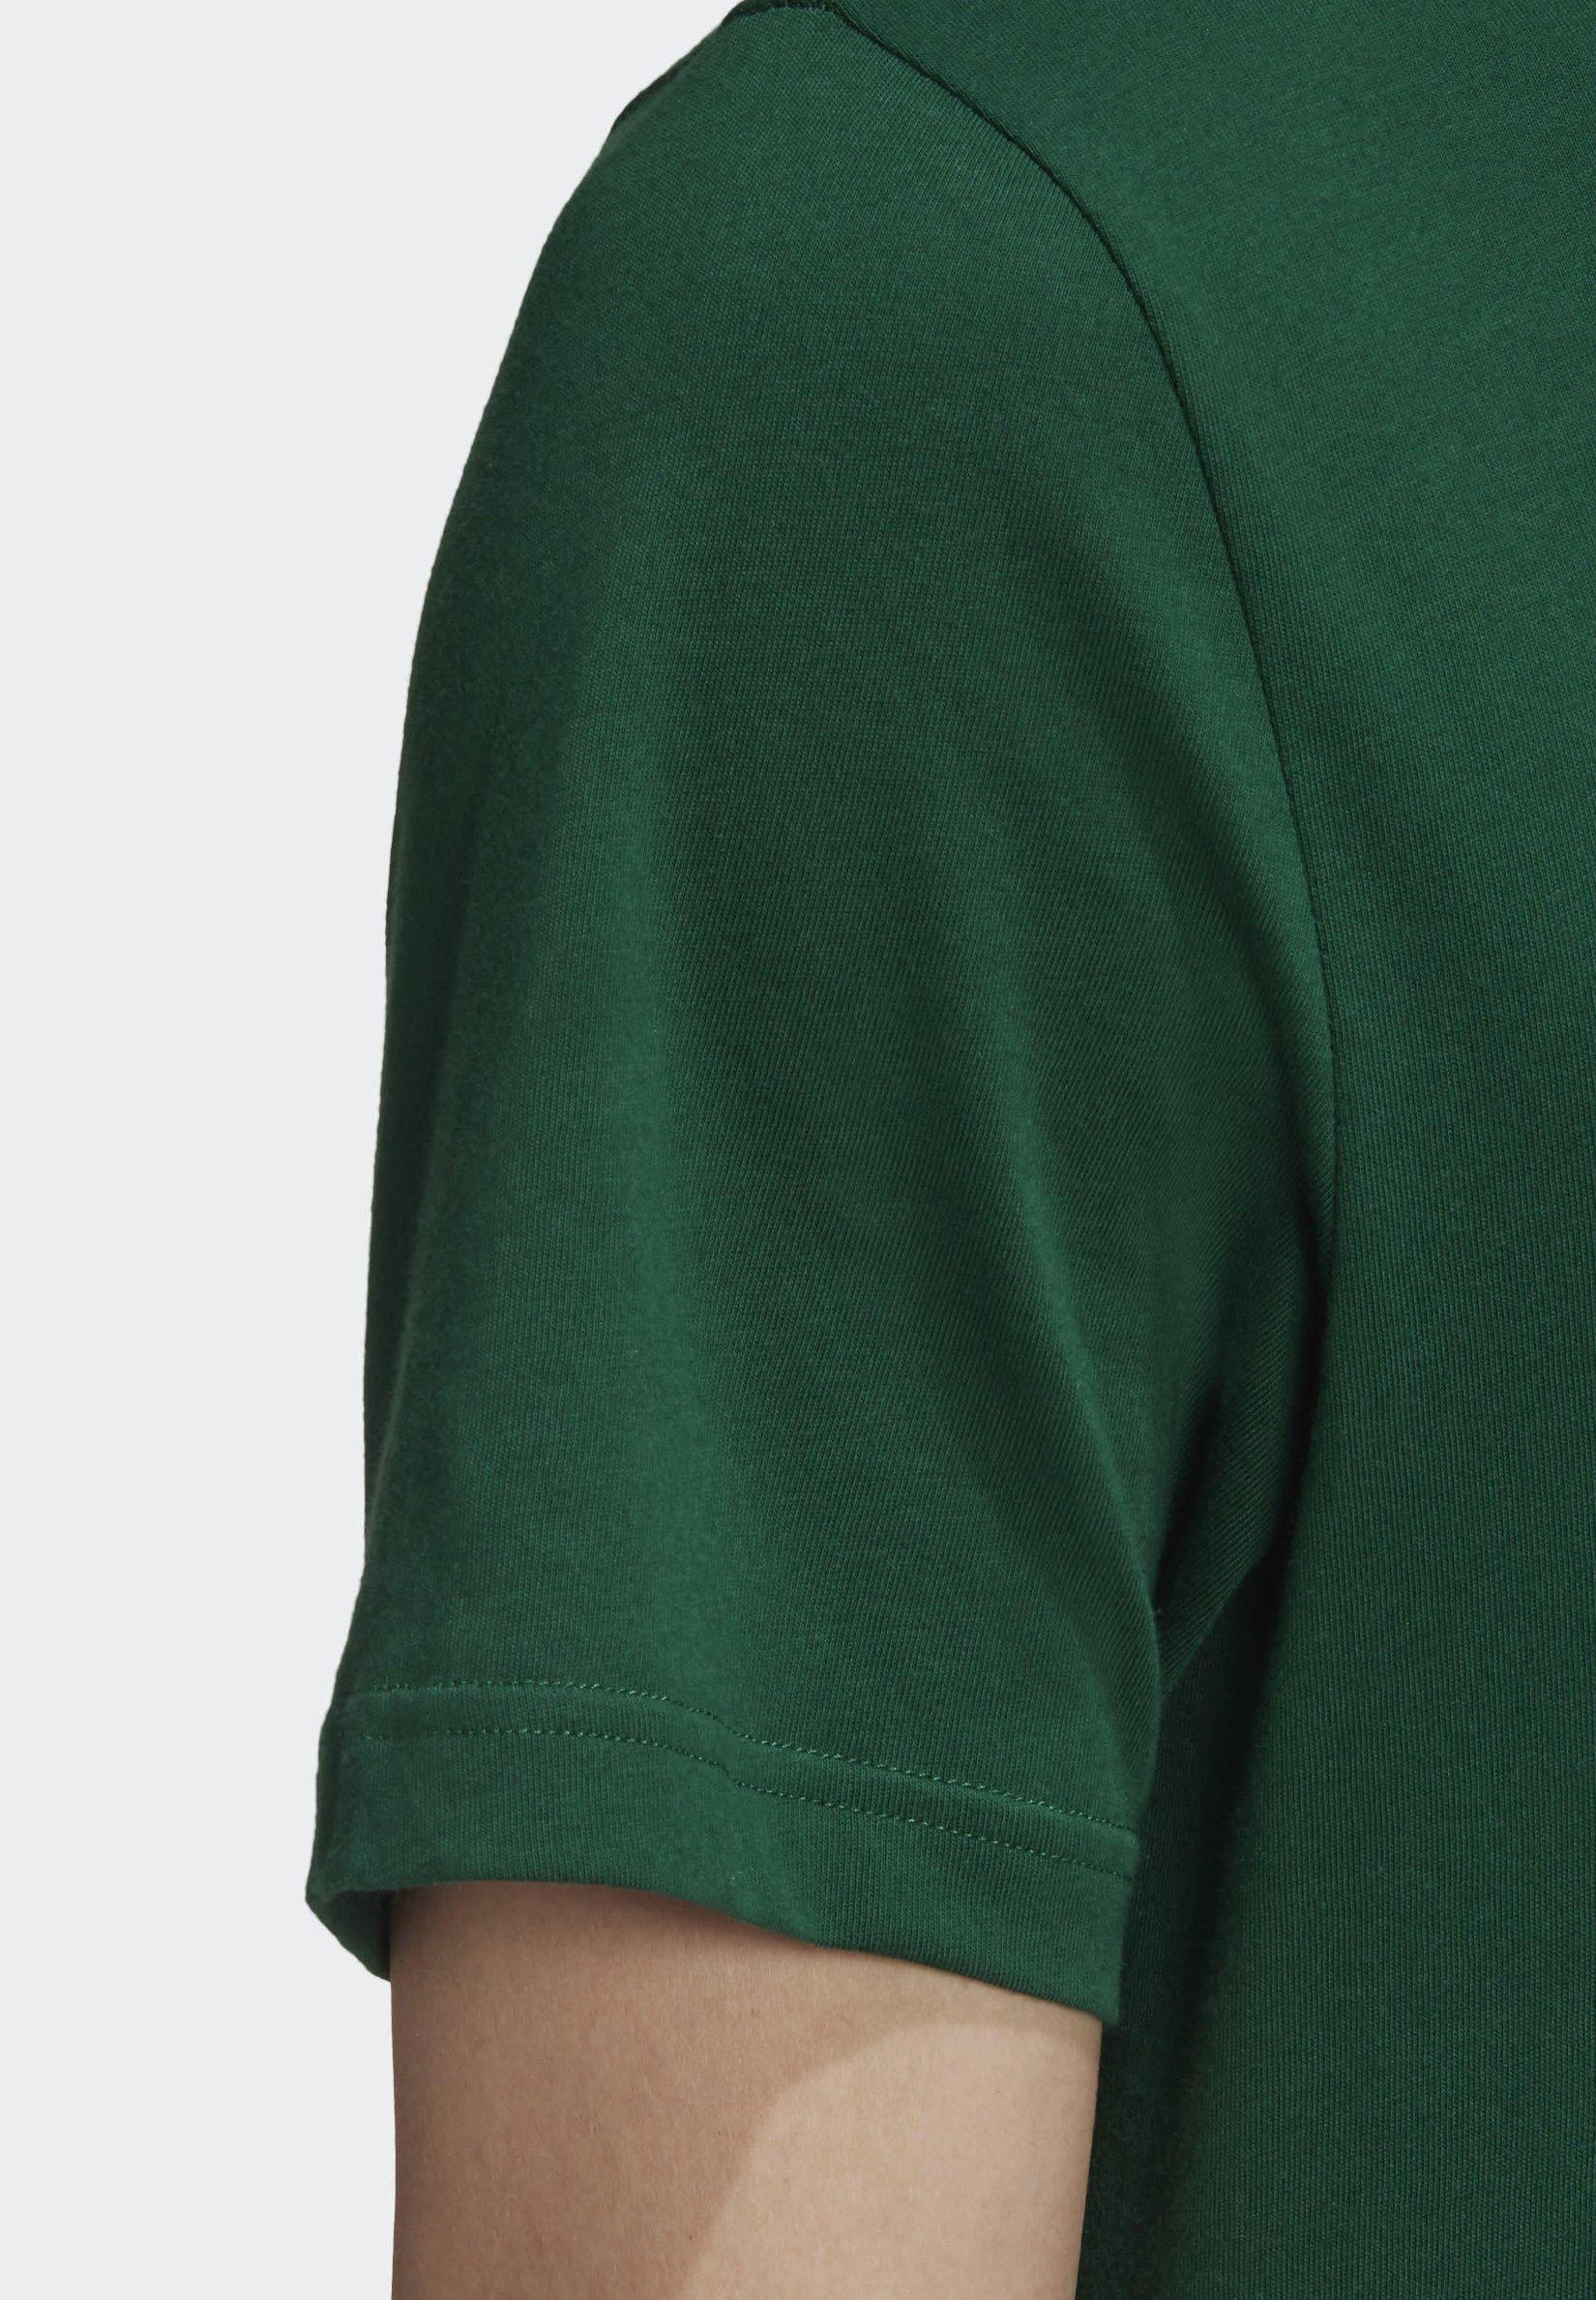 TREFOIL ESSENTIALS T SHIRT T shirts green